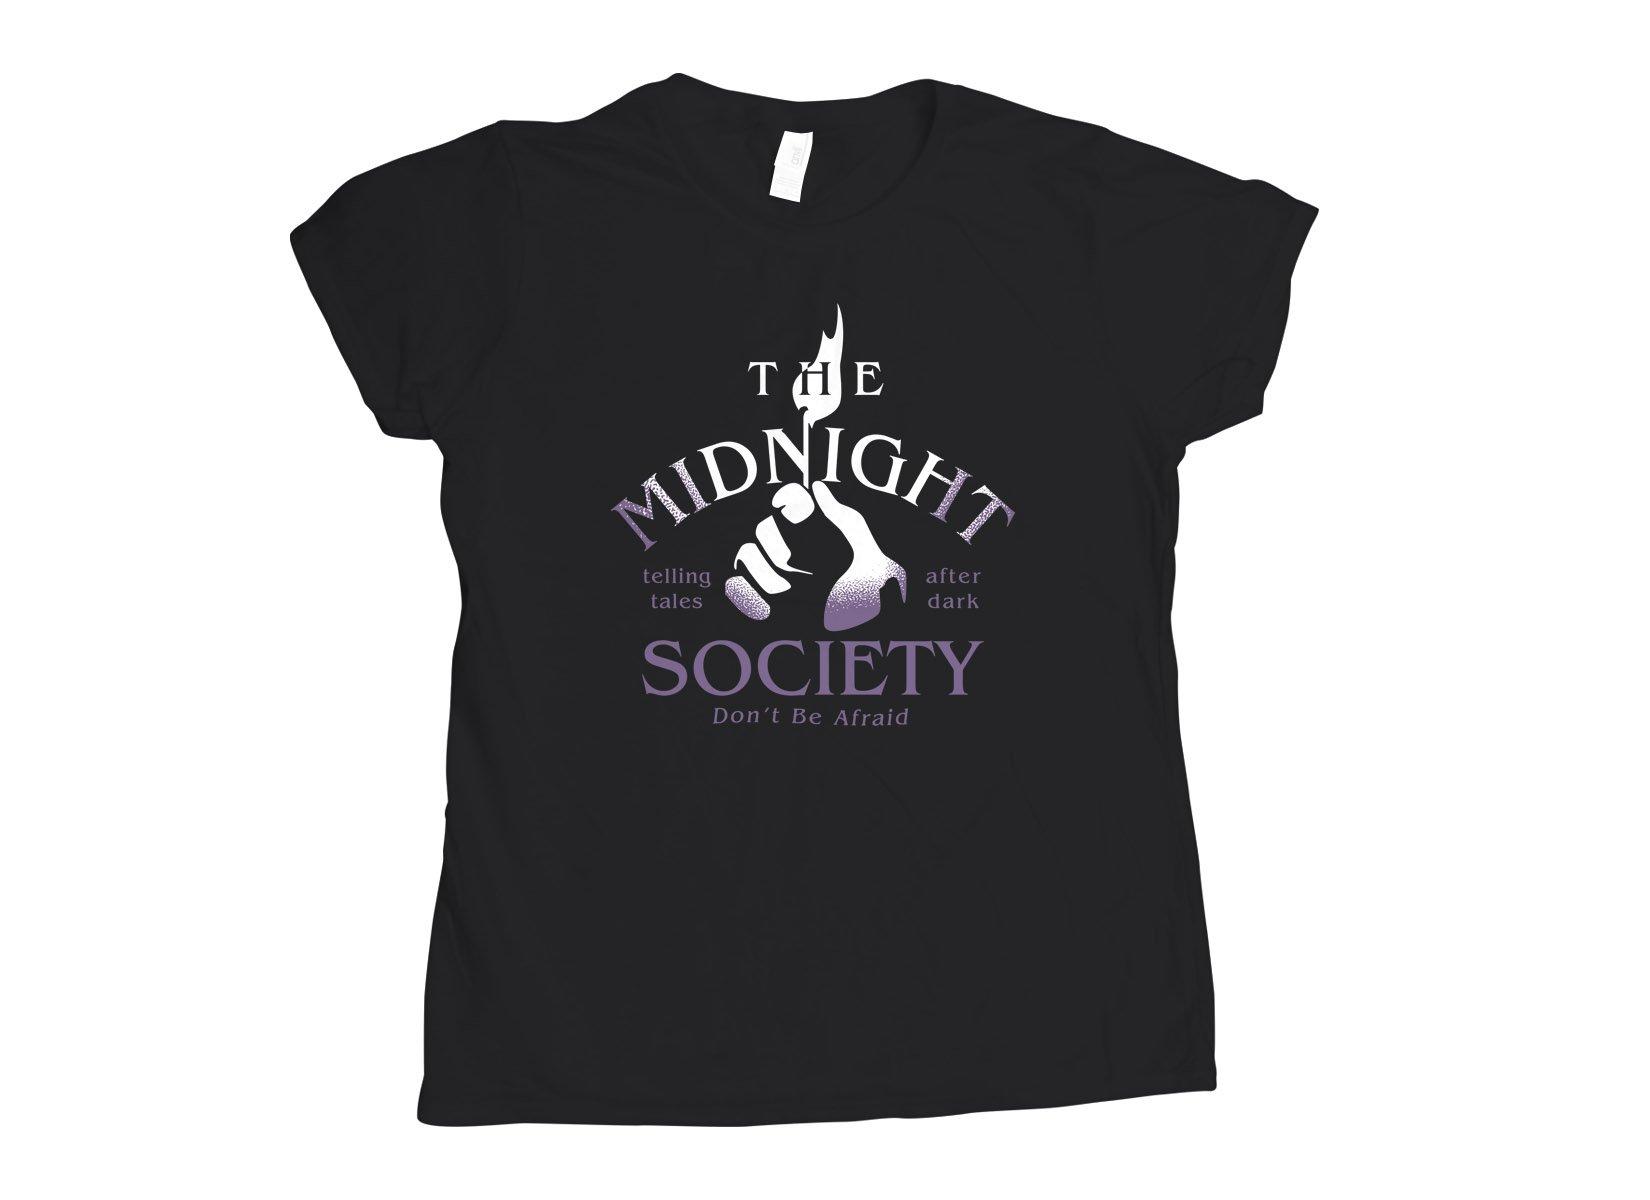 The Midnight Society on Womens T-Shirt